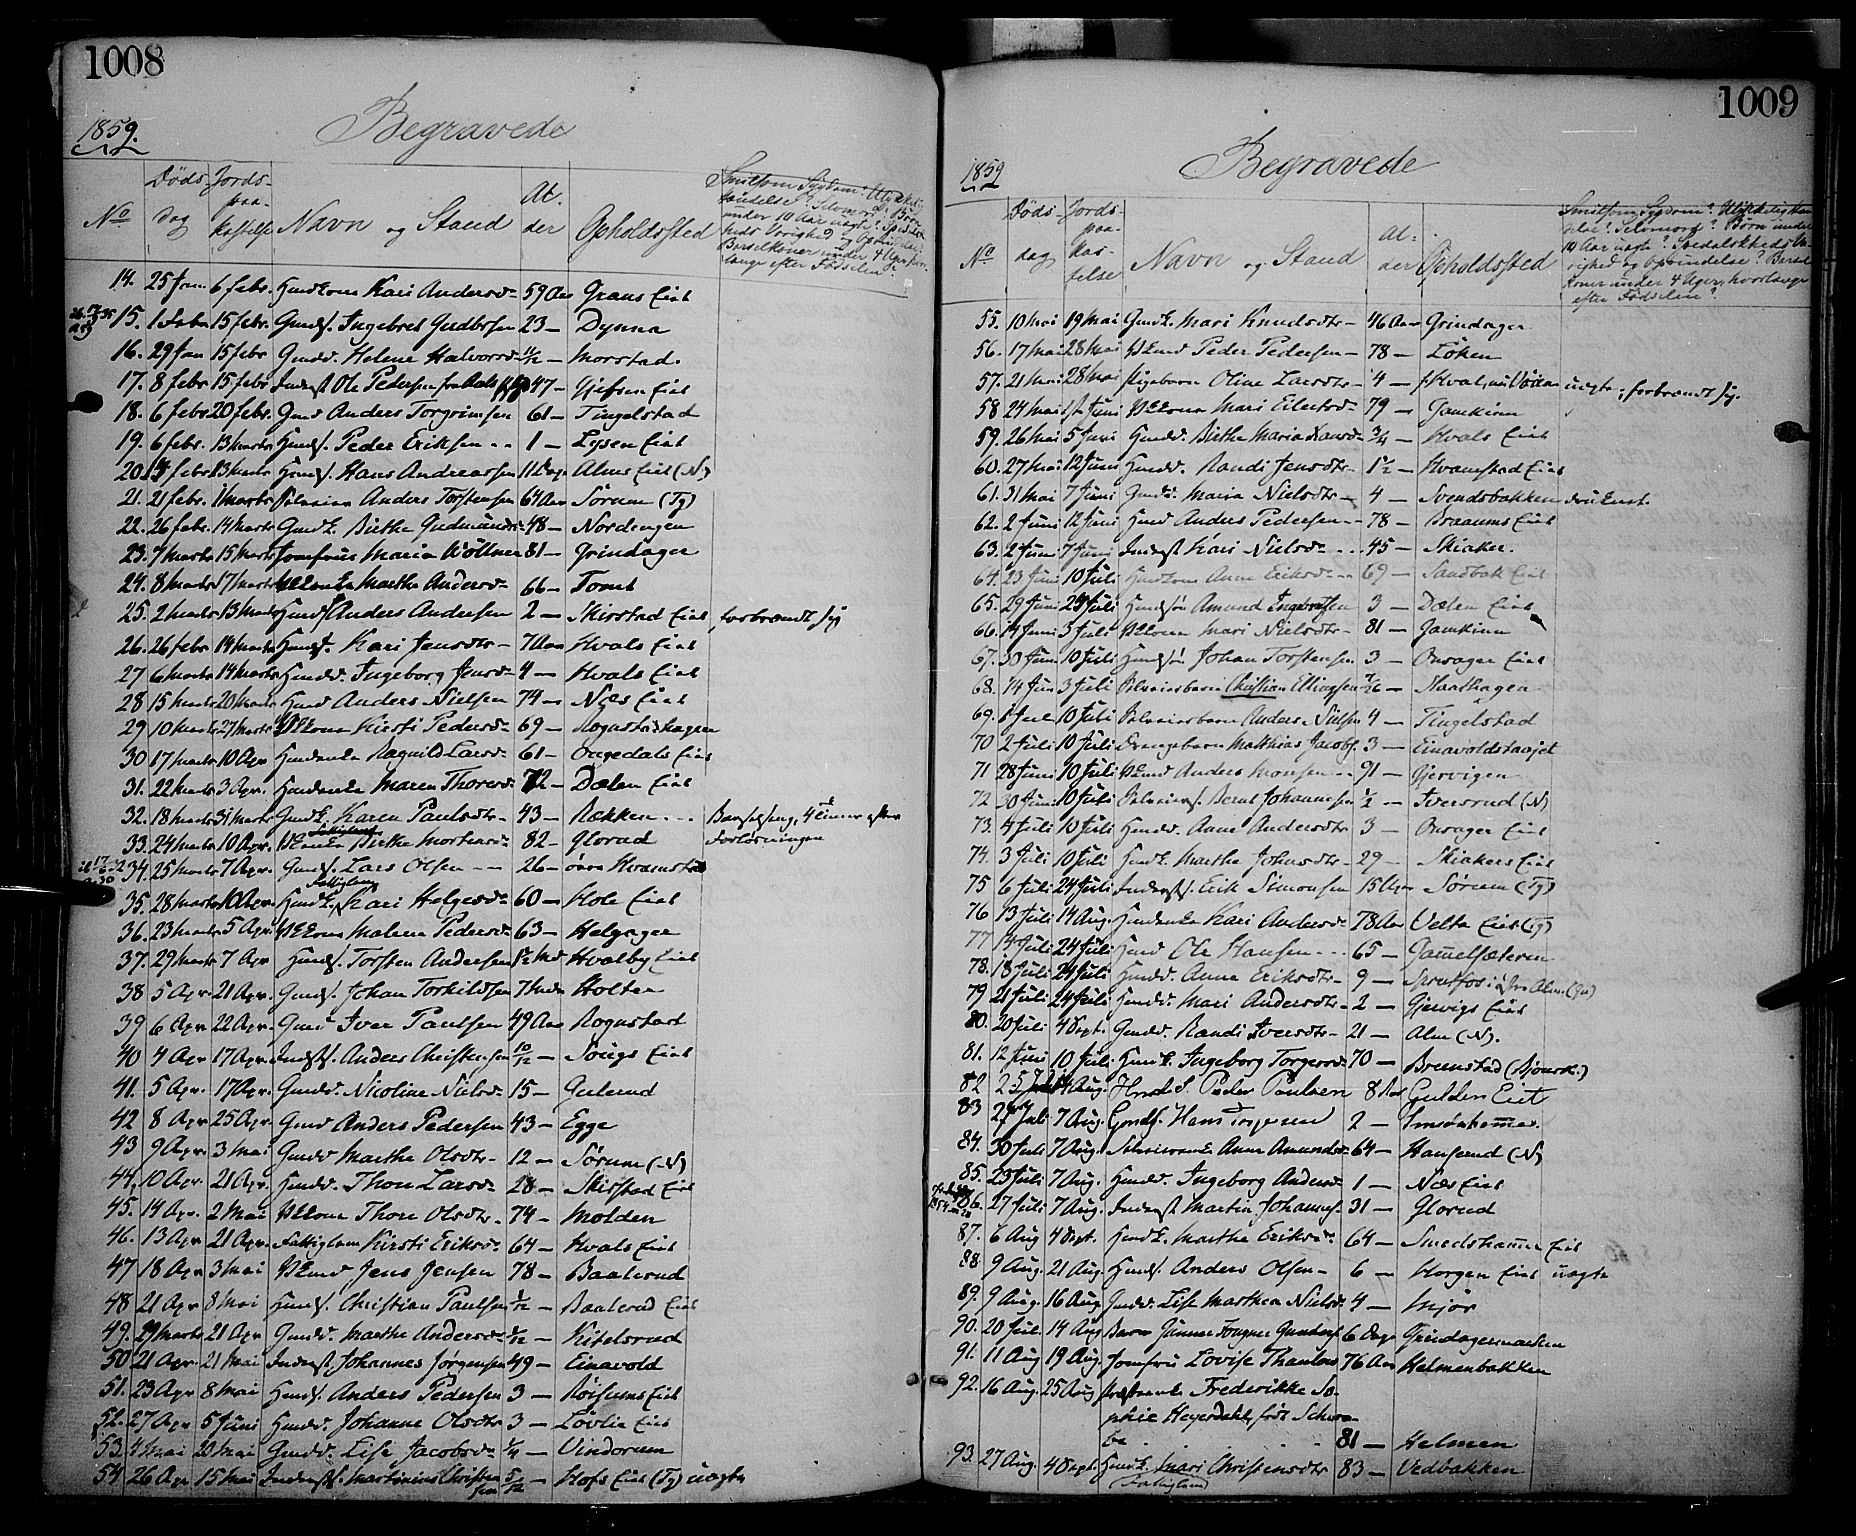 SAH, Gran prestekontor, Parish register (official) no. 12, 1856-1874, p. 1008-1009